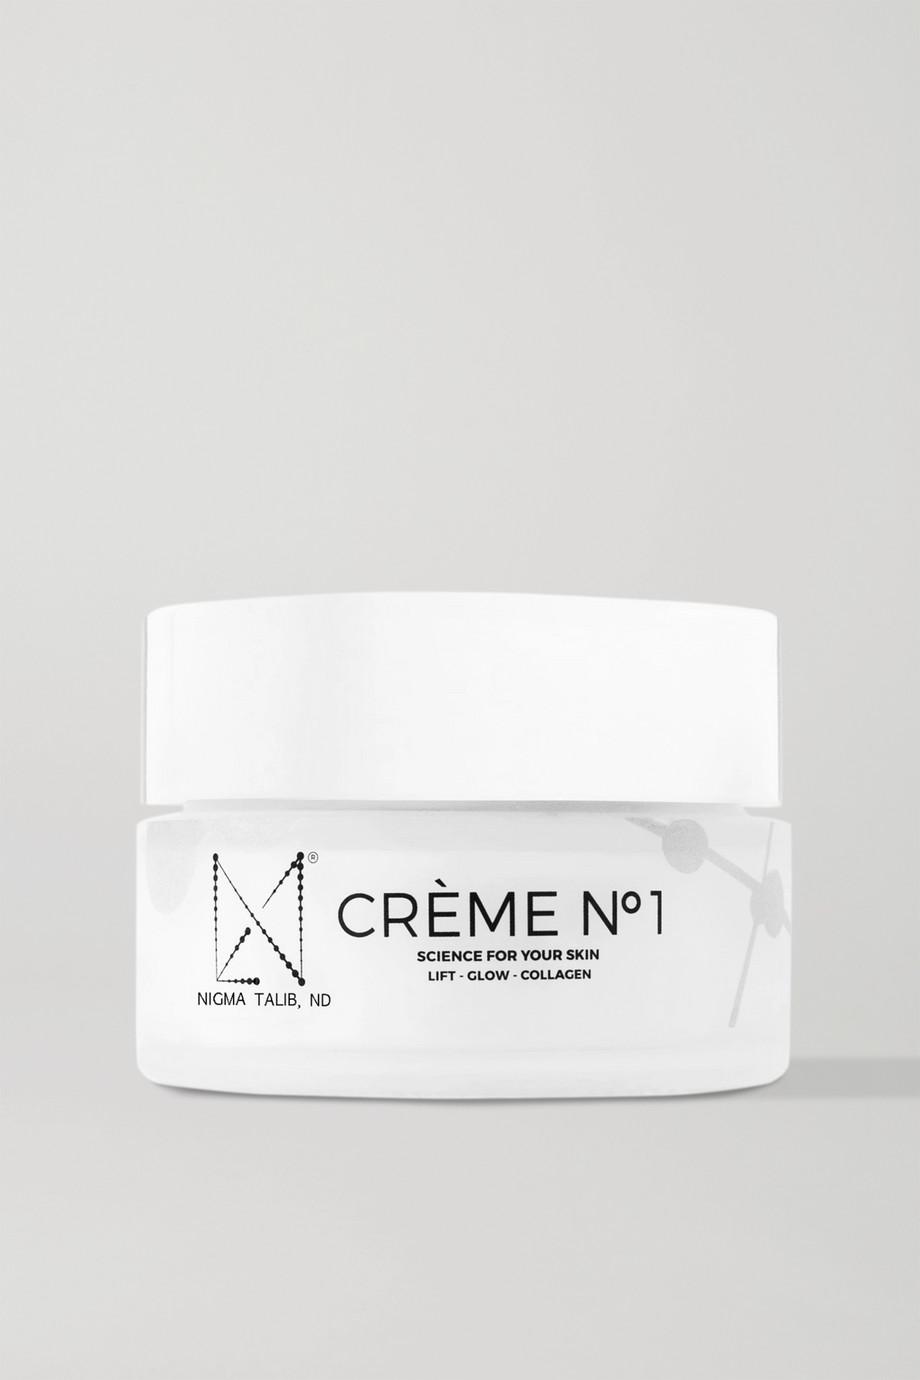 Nigma Talib ND Crème N°1, 50 ml – Gesichtscreme